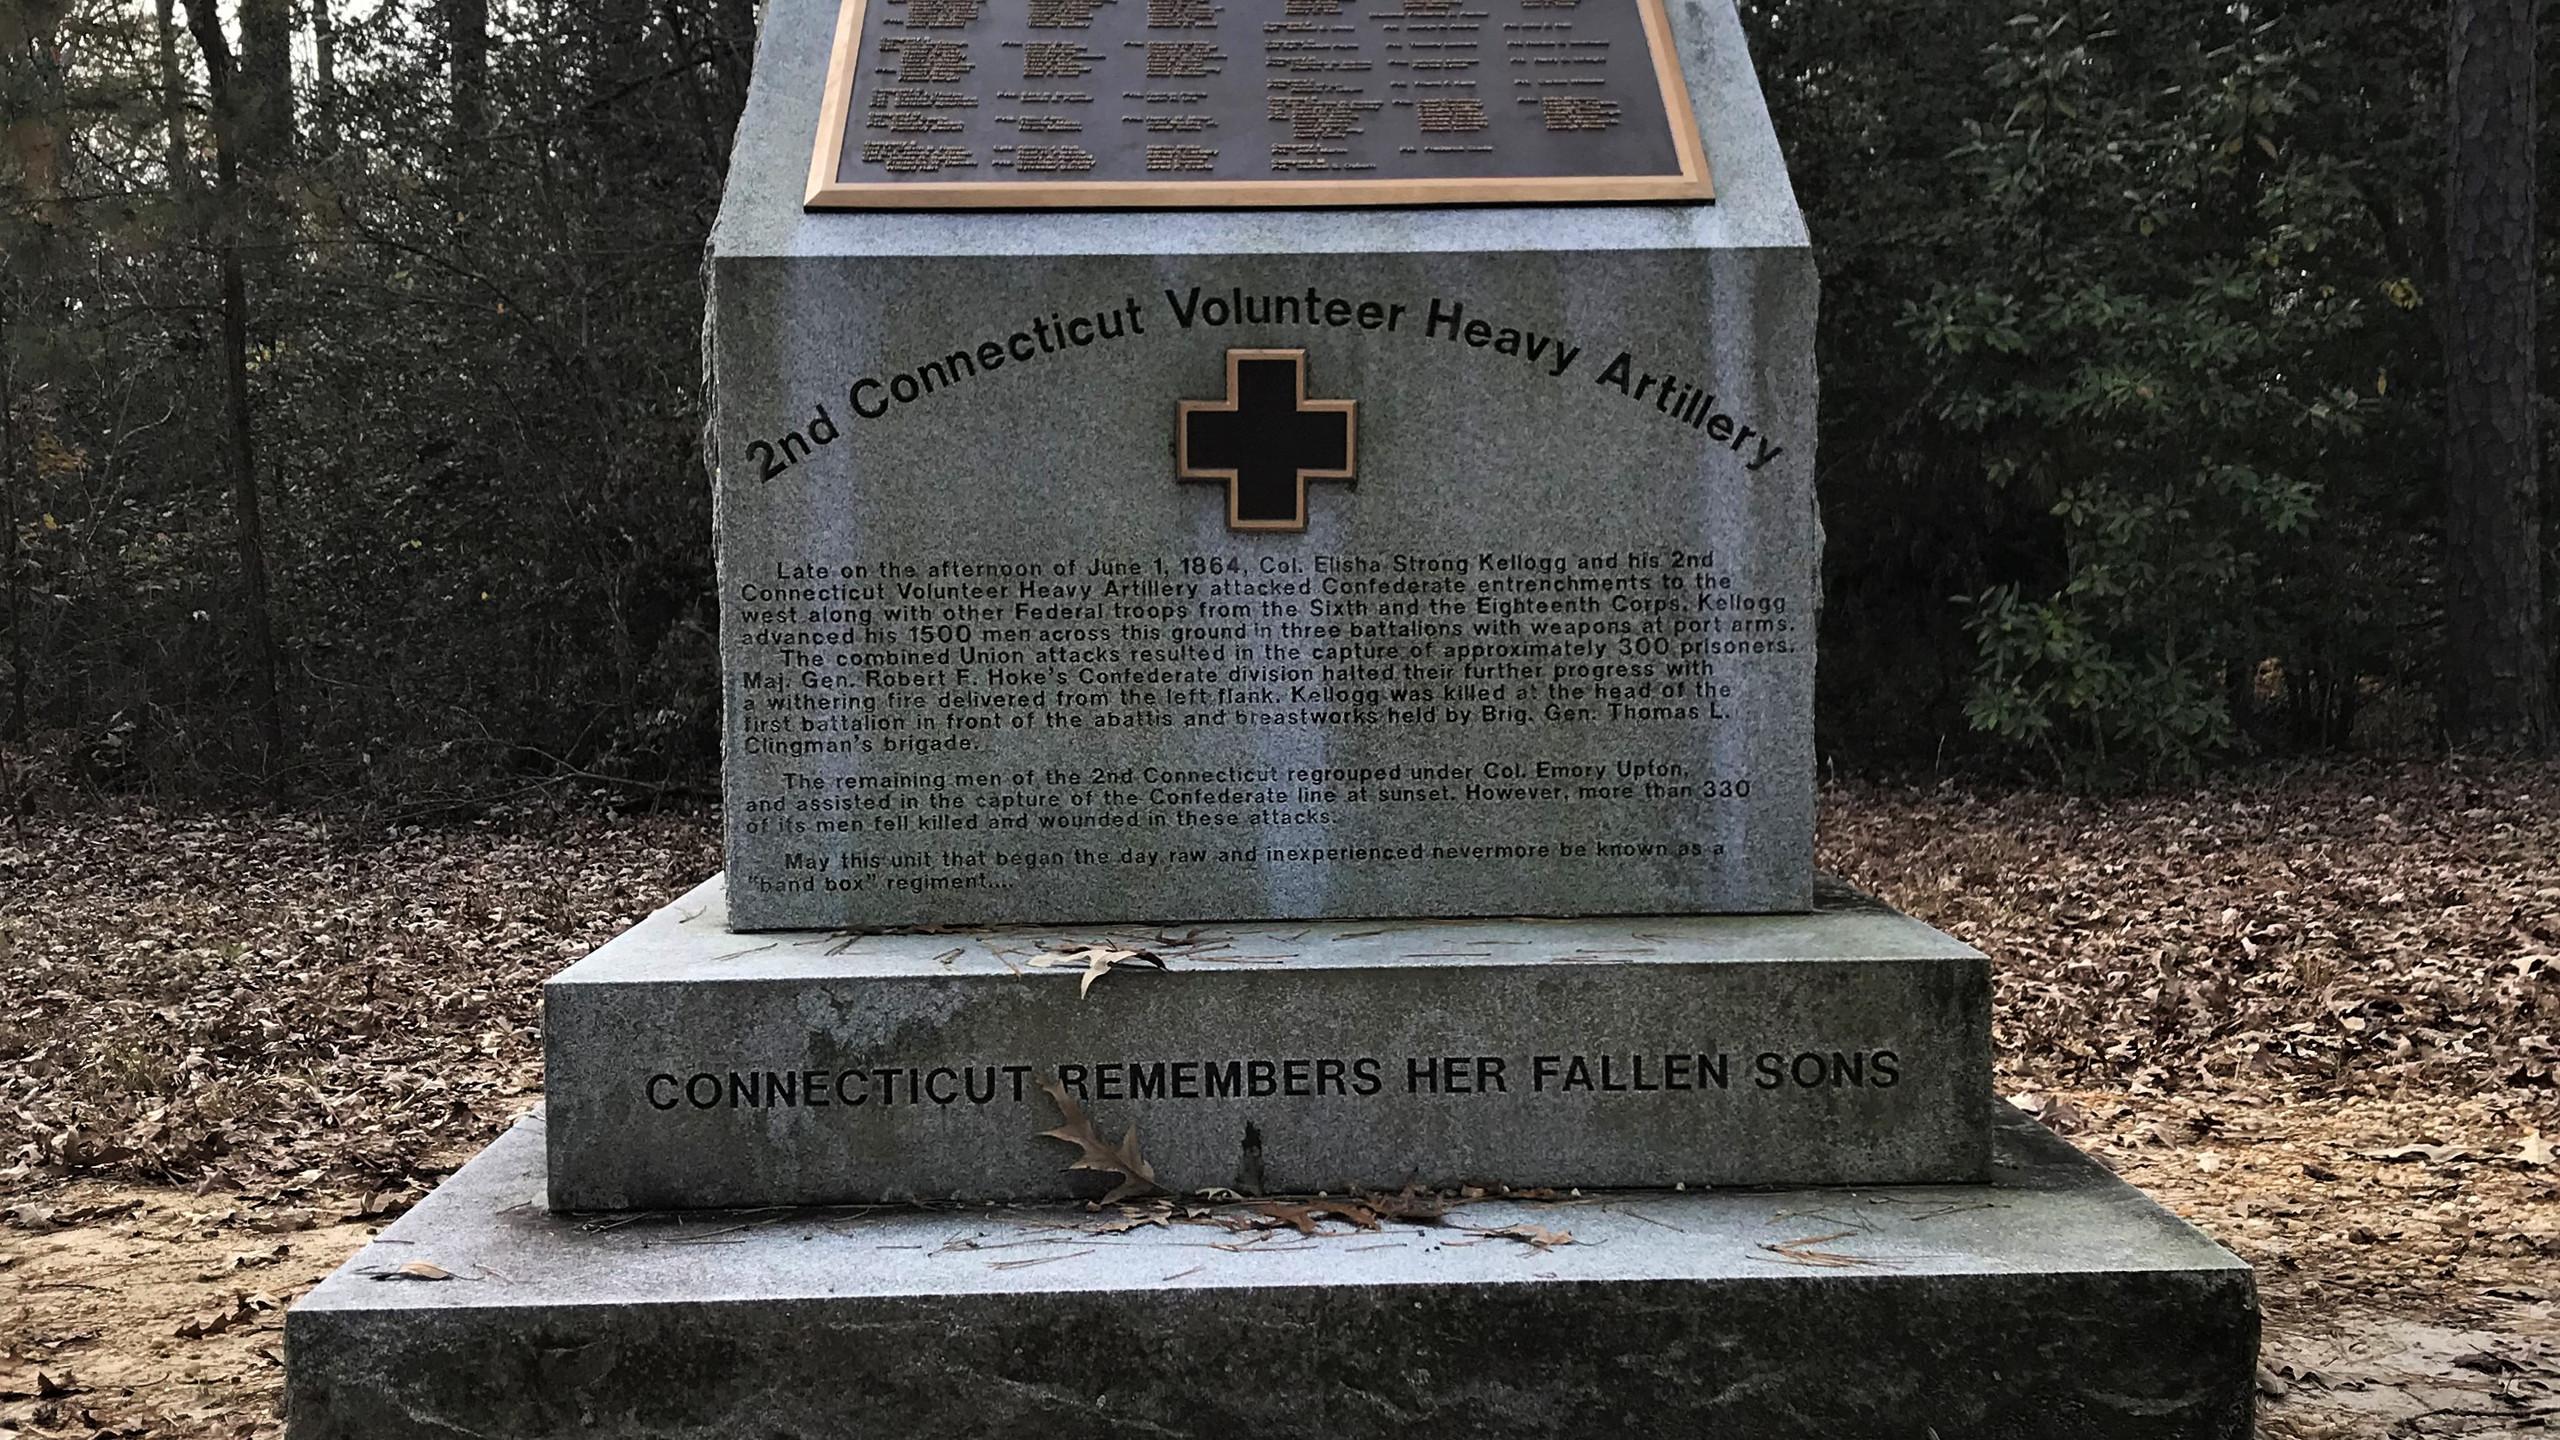 2nd Connecticut Artillery Monument